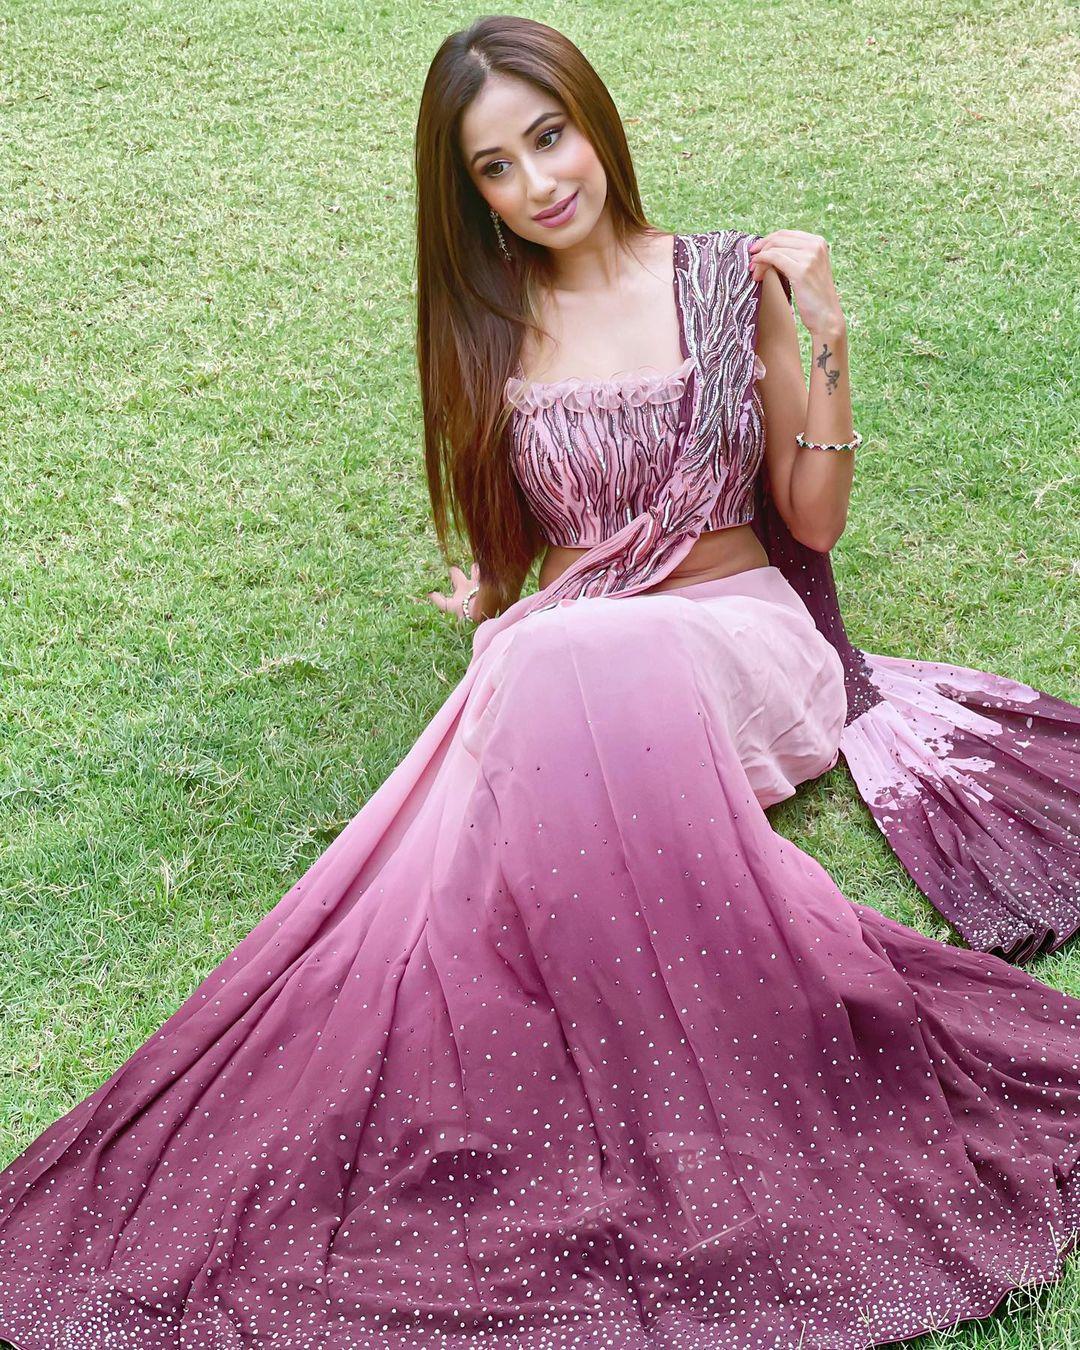 Maera Mishra Breakup With Adhyayan Suman